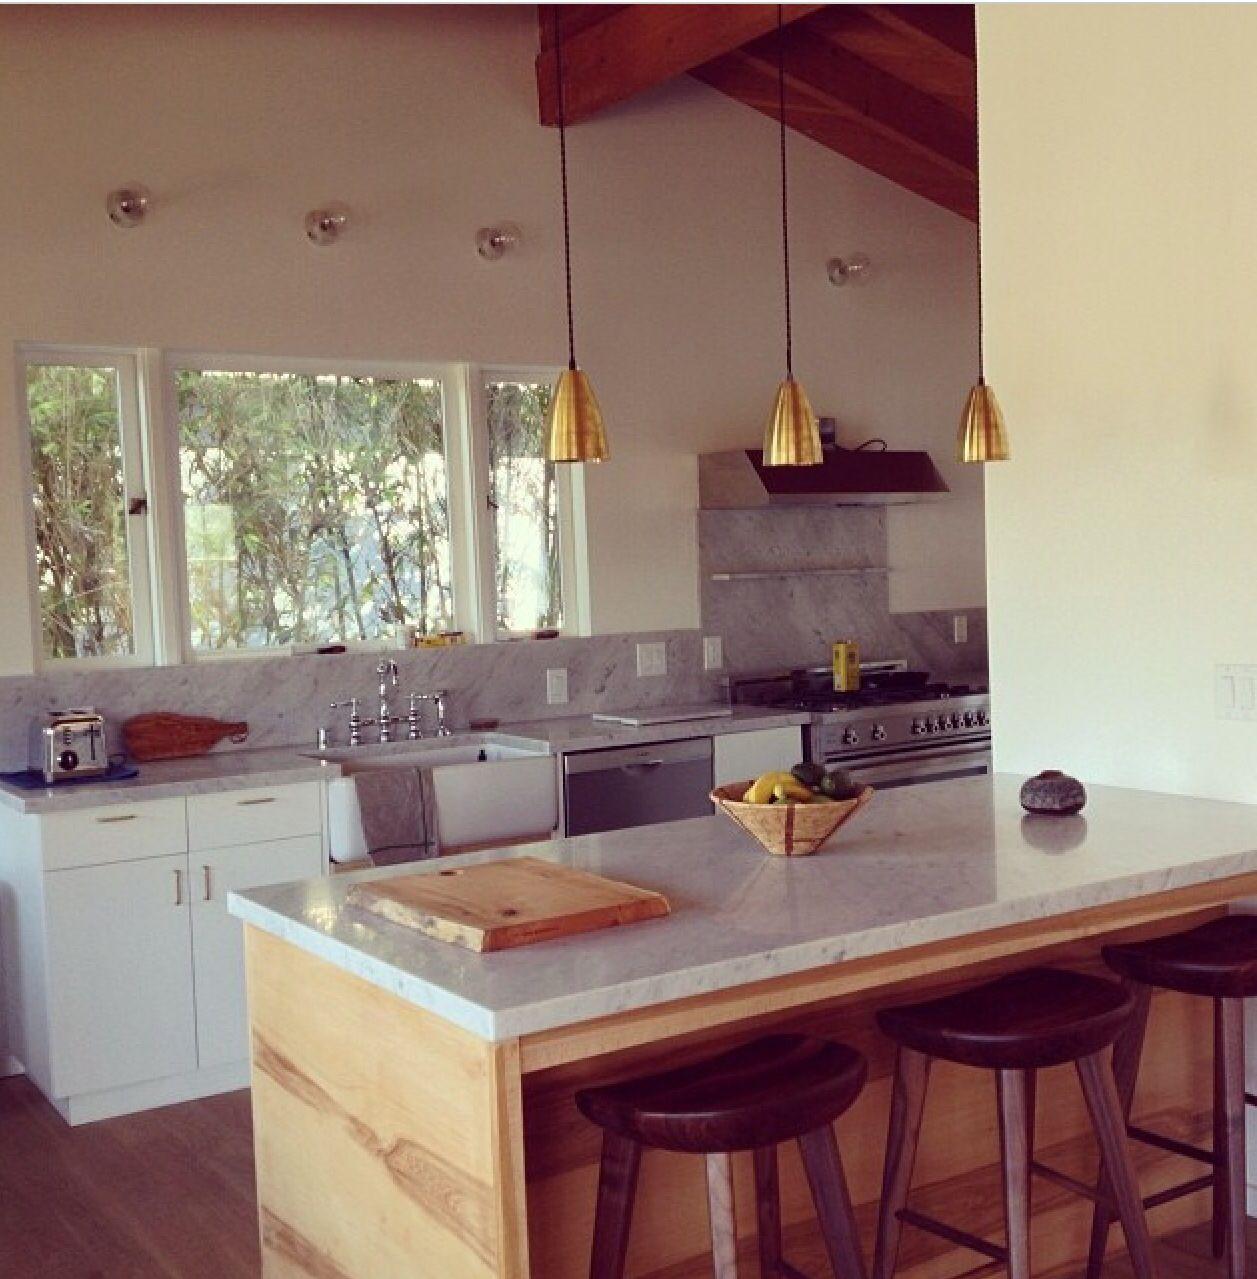 jeana sohn kitchen home sweet home interiors pinterest jeana sohn kitchen